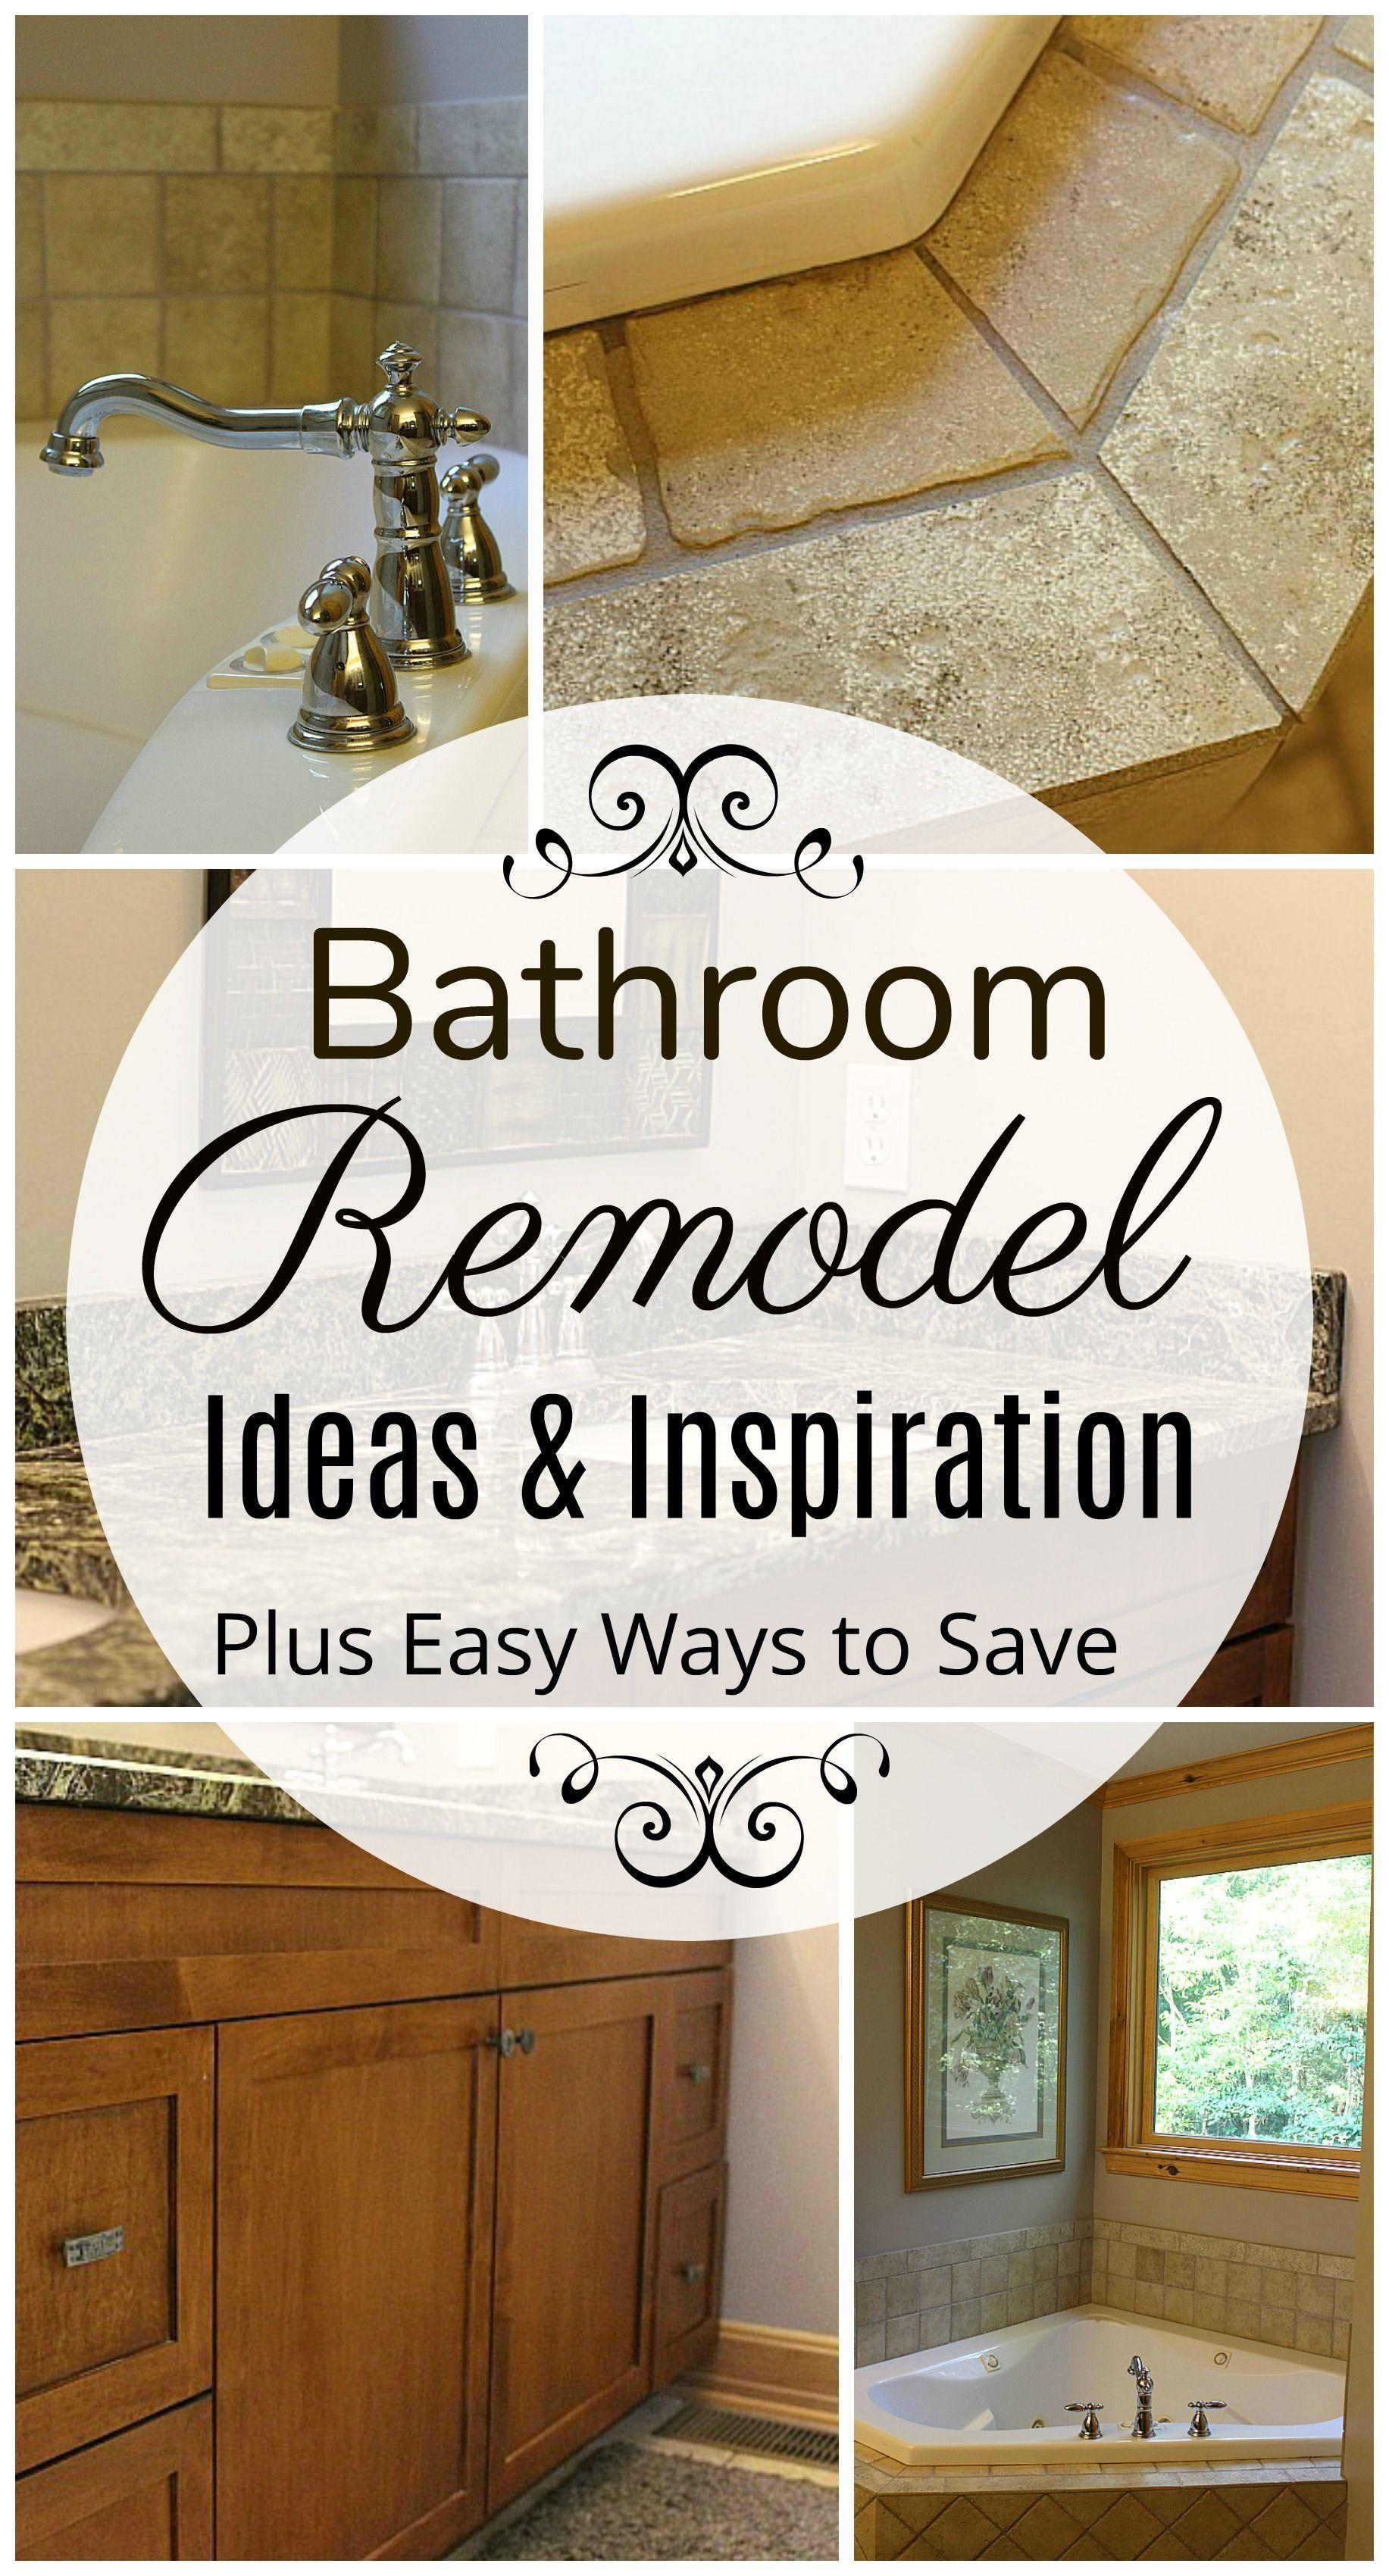 Bathroom Remodel Ideas Inspiration Bathrooms Remodel Home